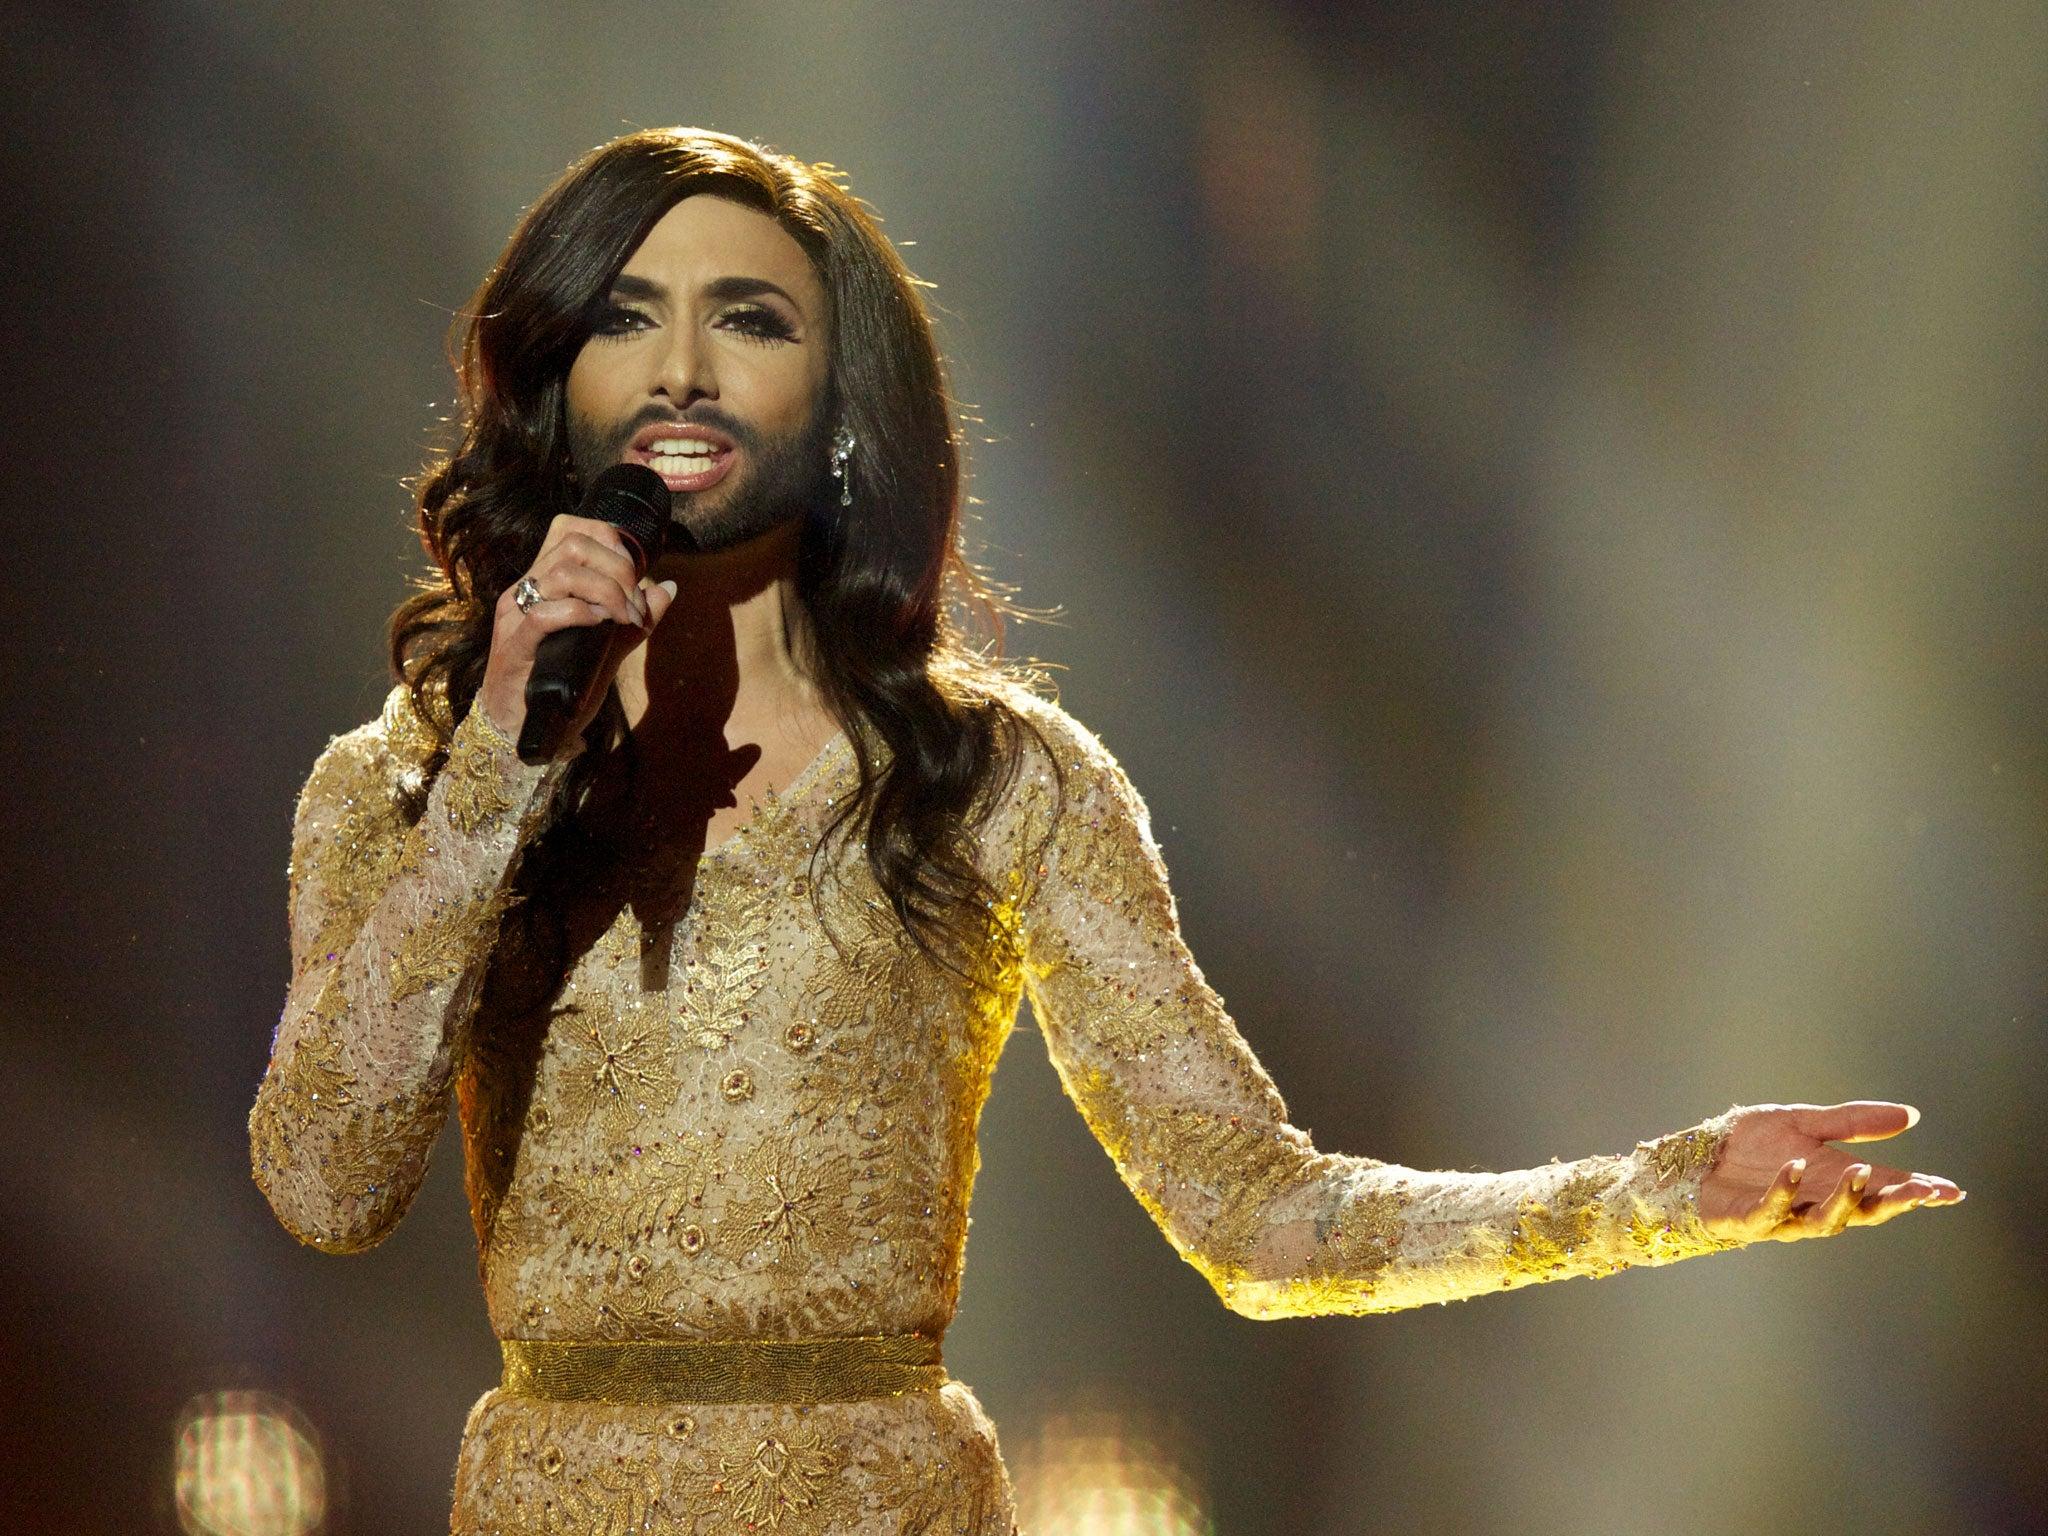 Pride in London 2014: Conchita Wurst to headline free gay